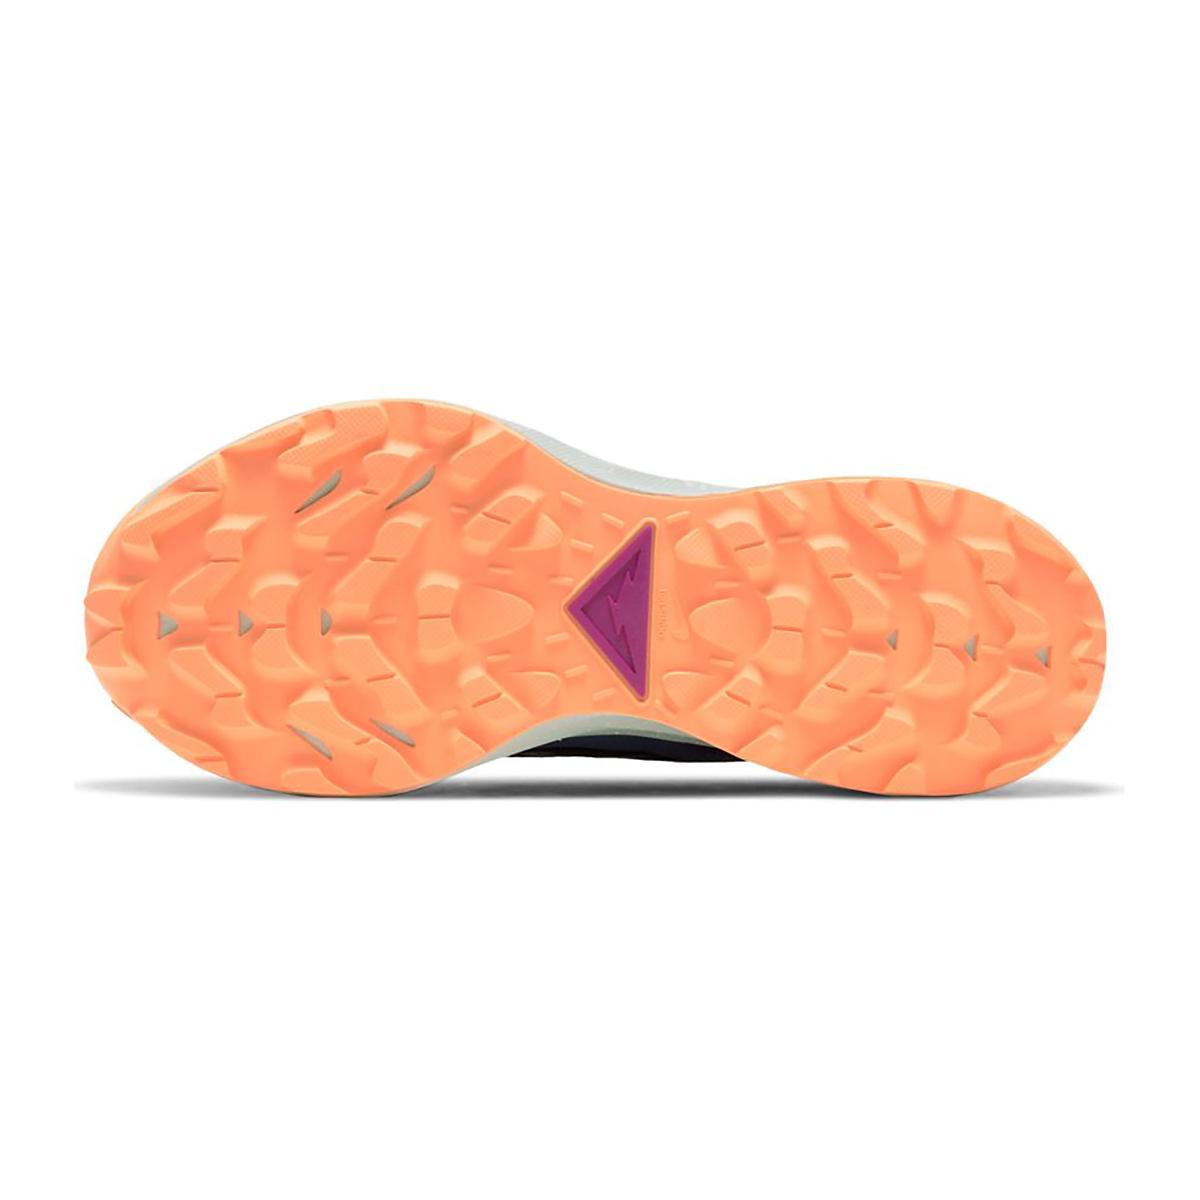 Women's Nike Pegasus Trail 2 Trail Running Shoe - Color: Thunder Blue/Photon Dust/Ashen Slate - Size: 5 - Width: Regular, Thunder Blue/Photon Dust/Ashen Slate, large, image 3